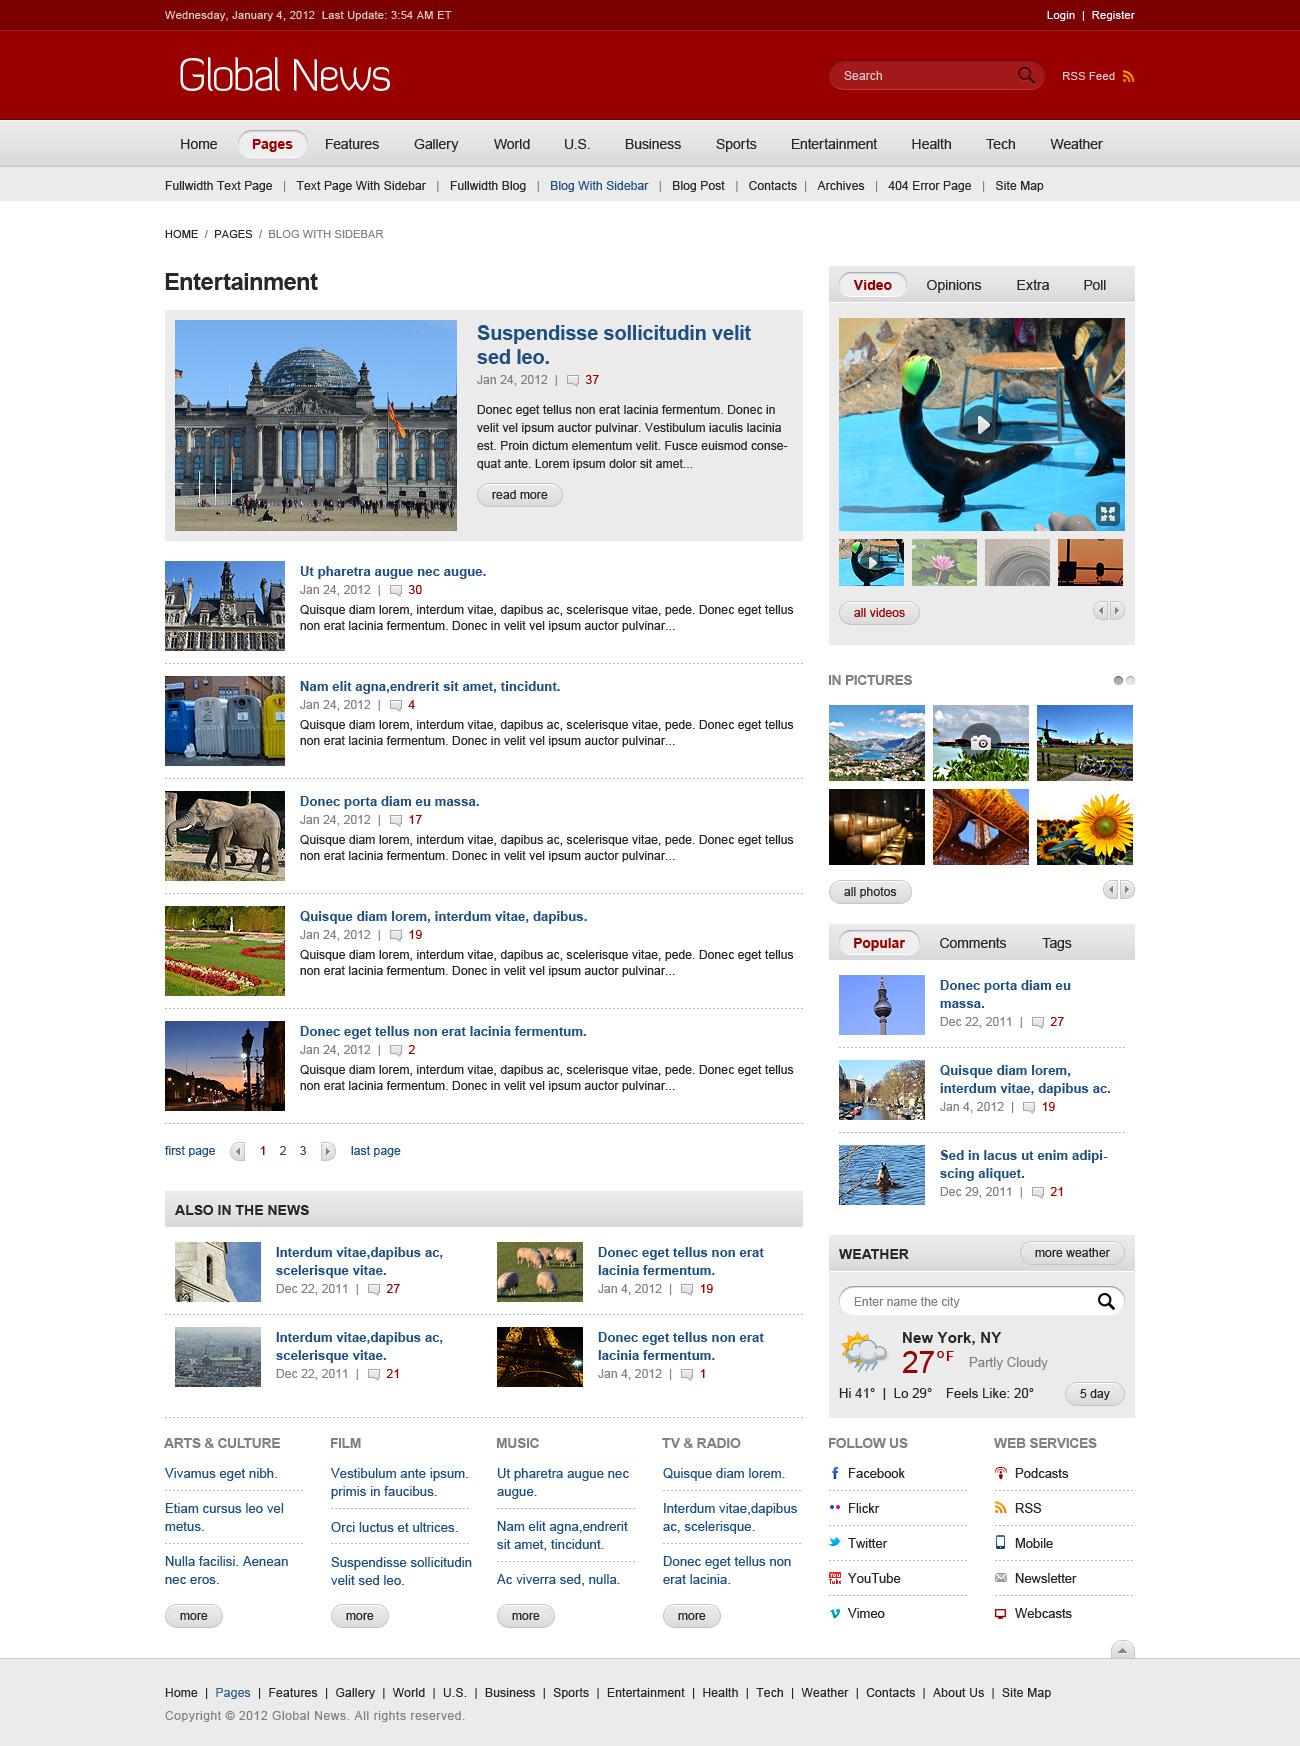 Global News Portal - HTML5 & CSS3 Template by Monkeysan | ThemeForest